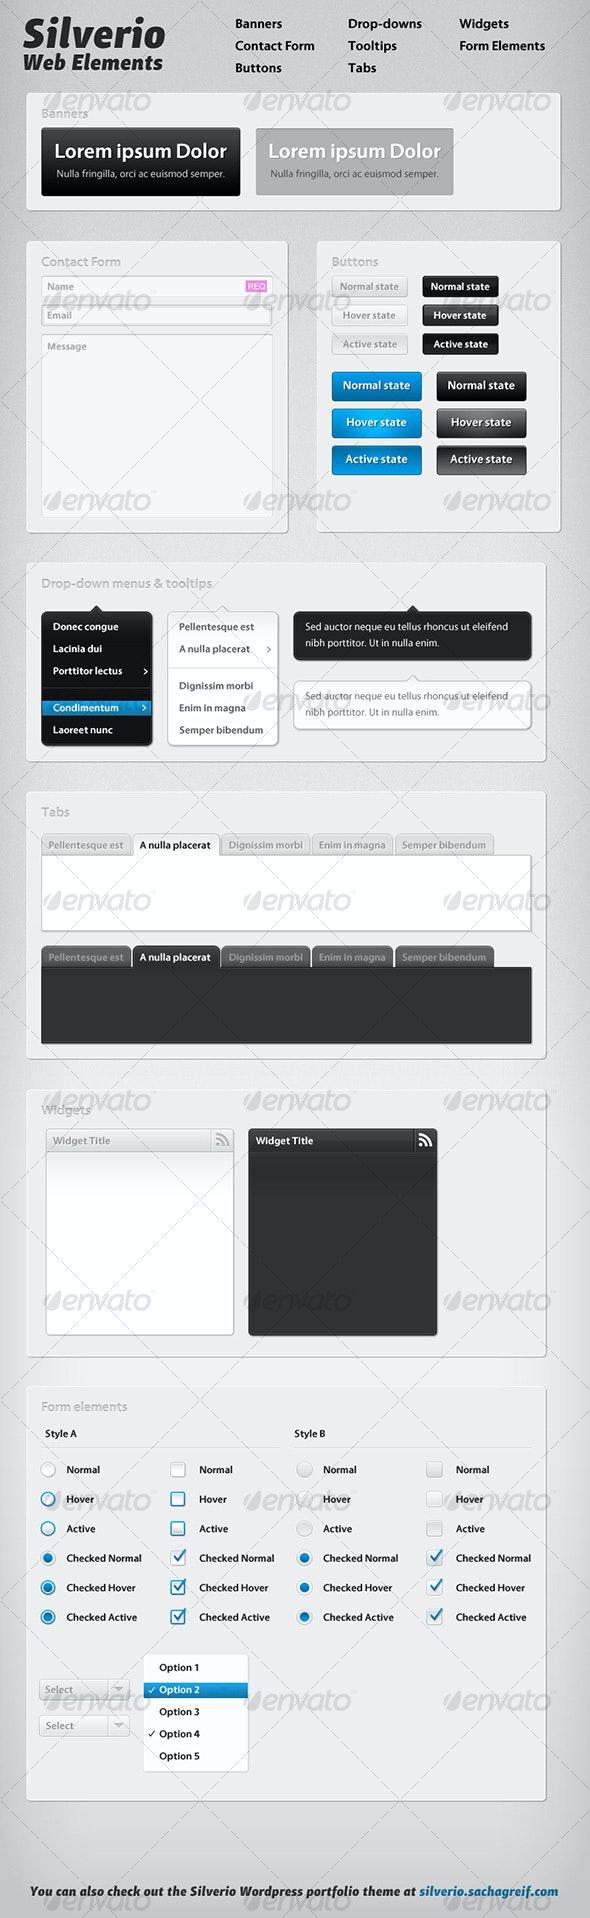 Silverio Web Elements - Web Elements